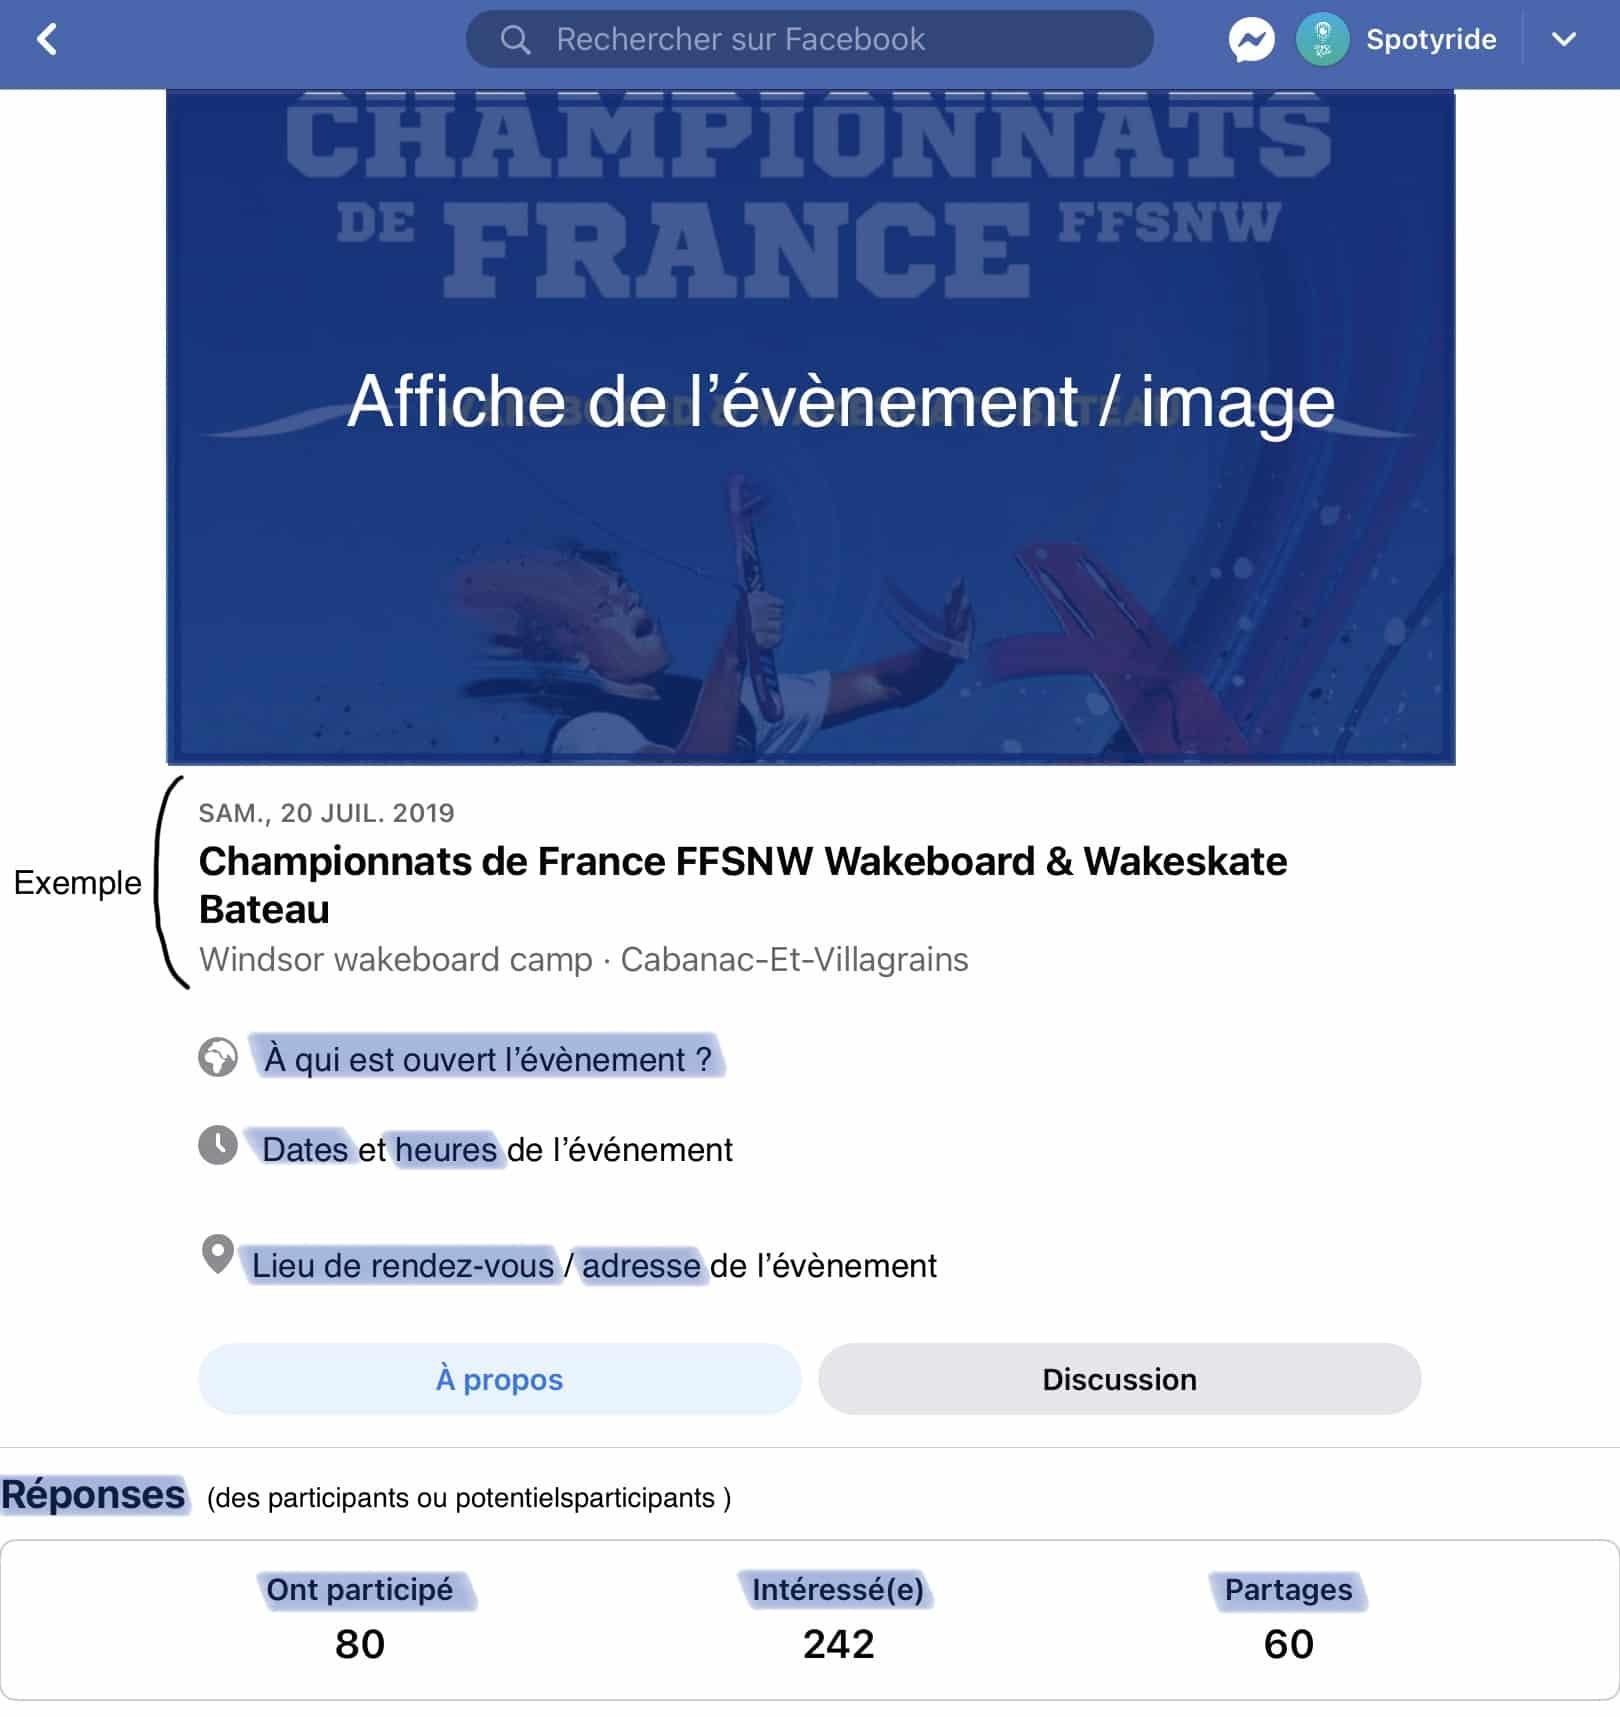 events-facebook-1-spotyride-pro